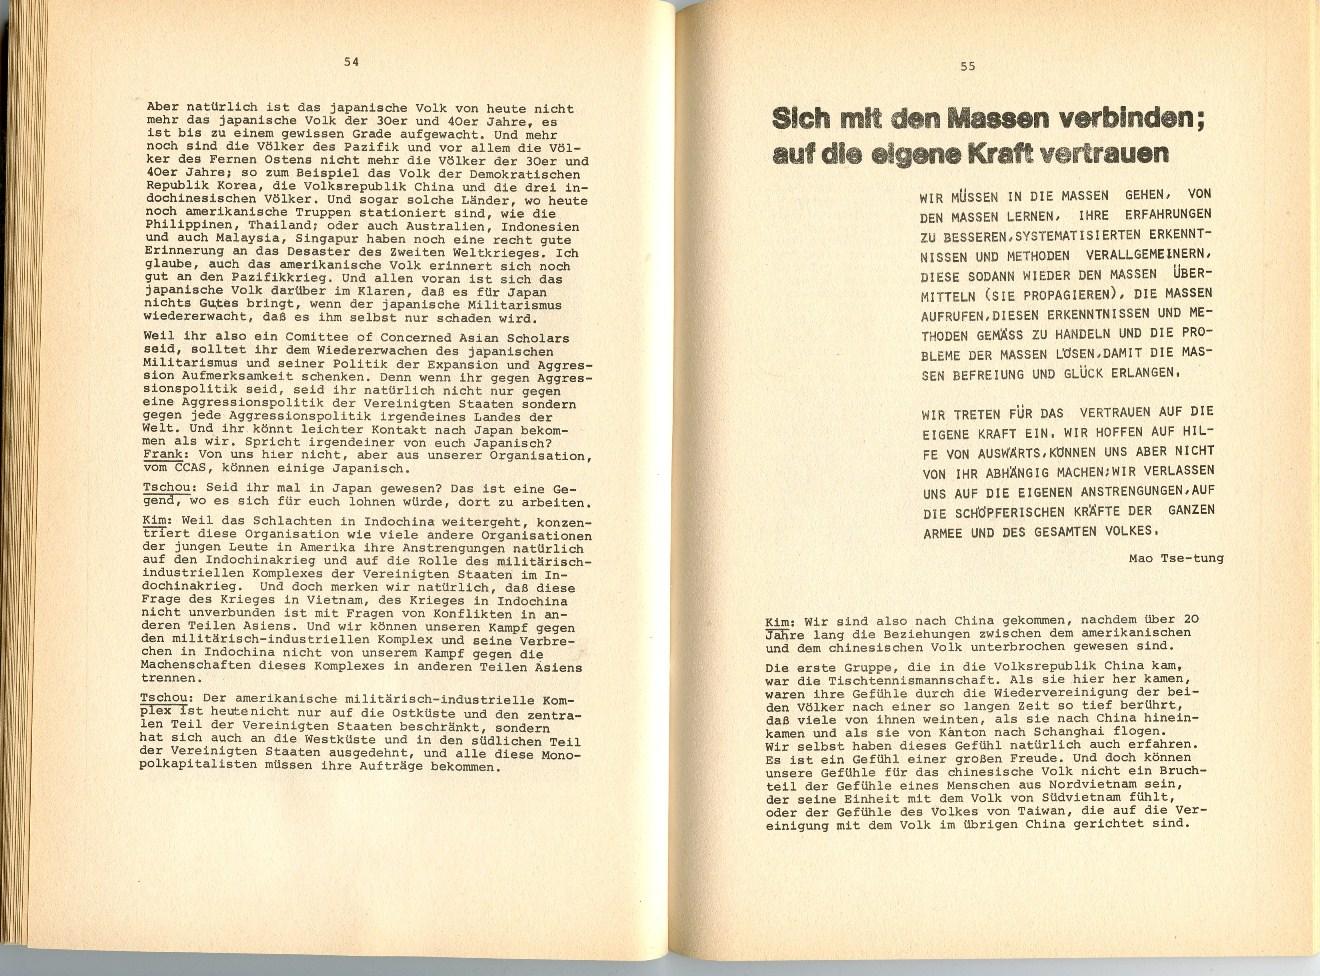 ZB_VRChina_Bollwerk_1971_29